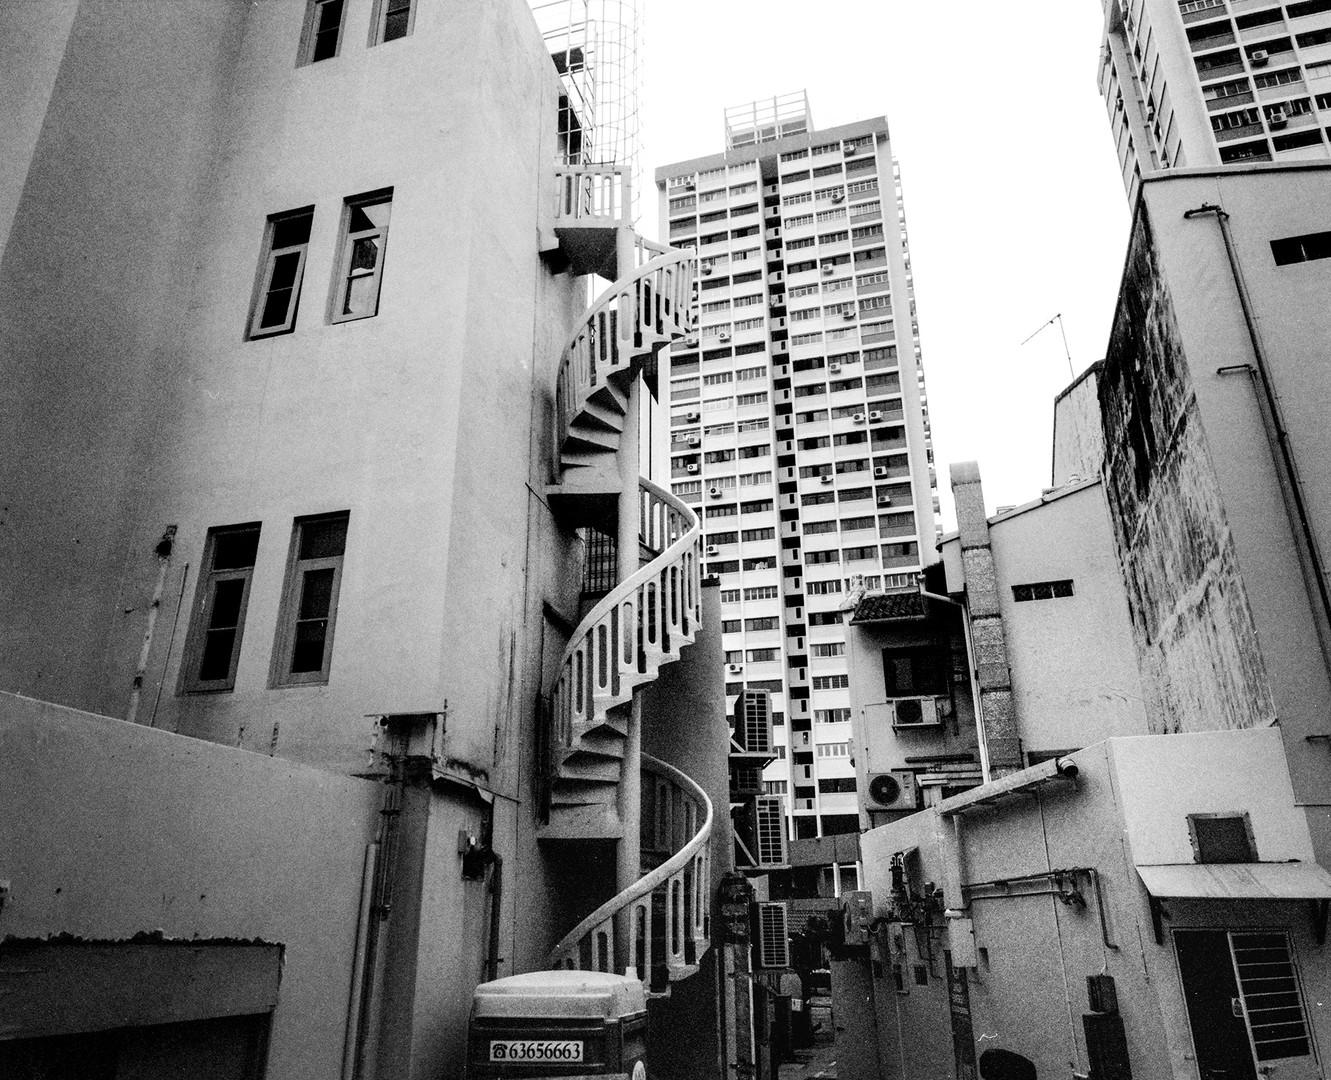 Goodman-zone-camera-shot-Singapore-5.jpg